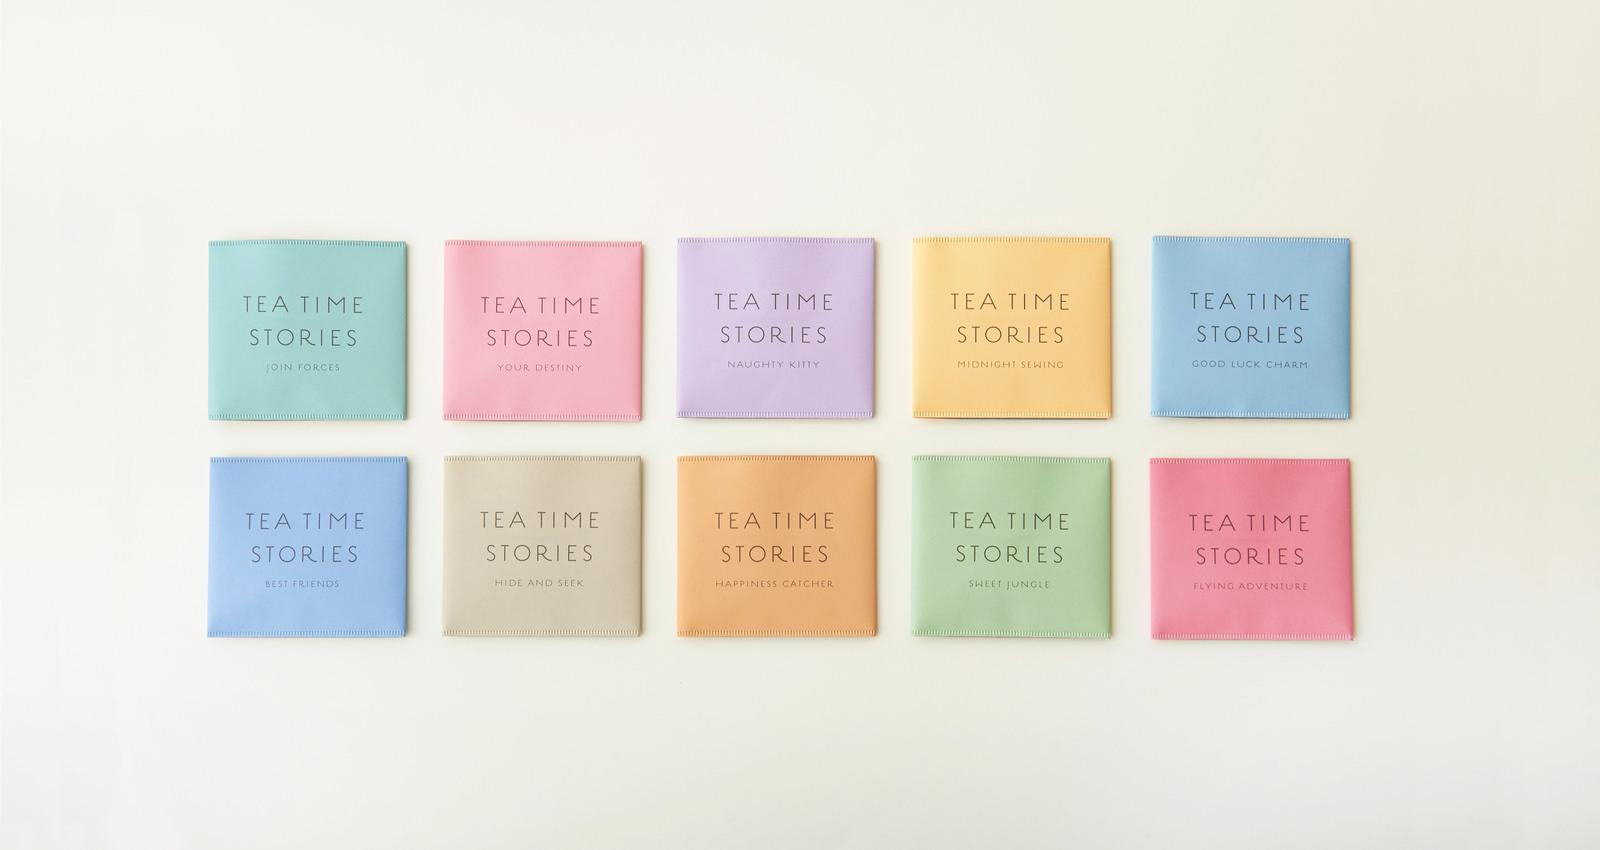 TEA TIME STORIES